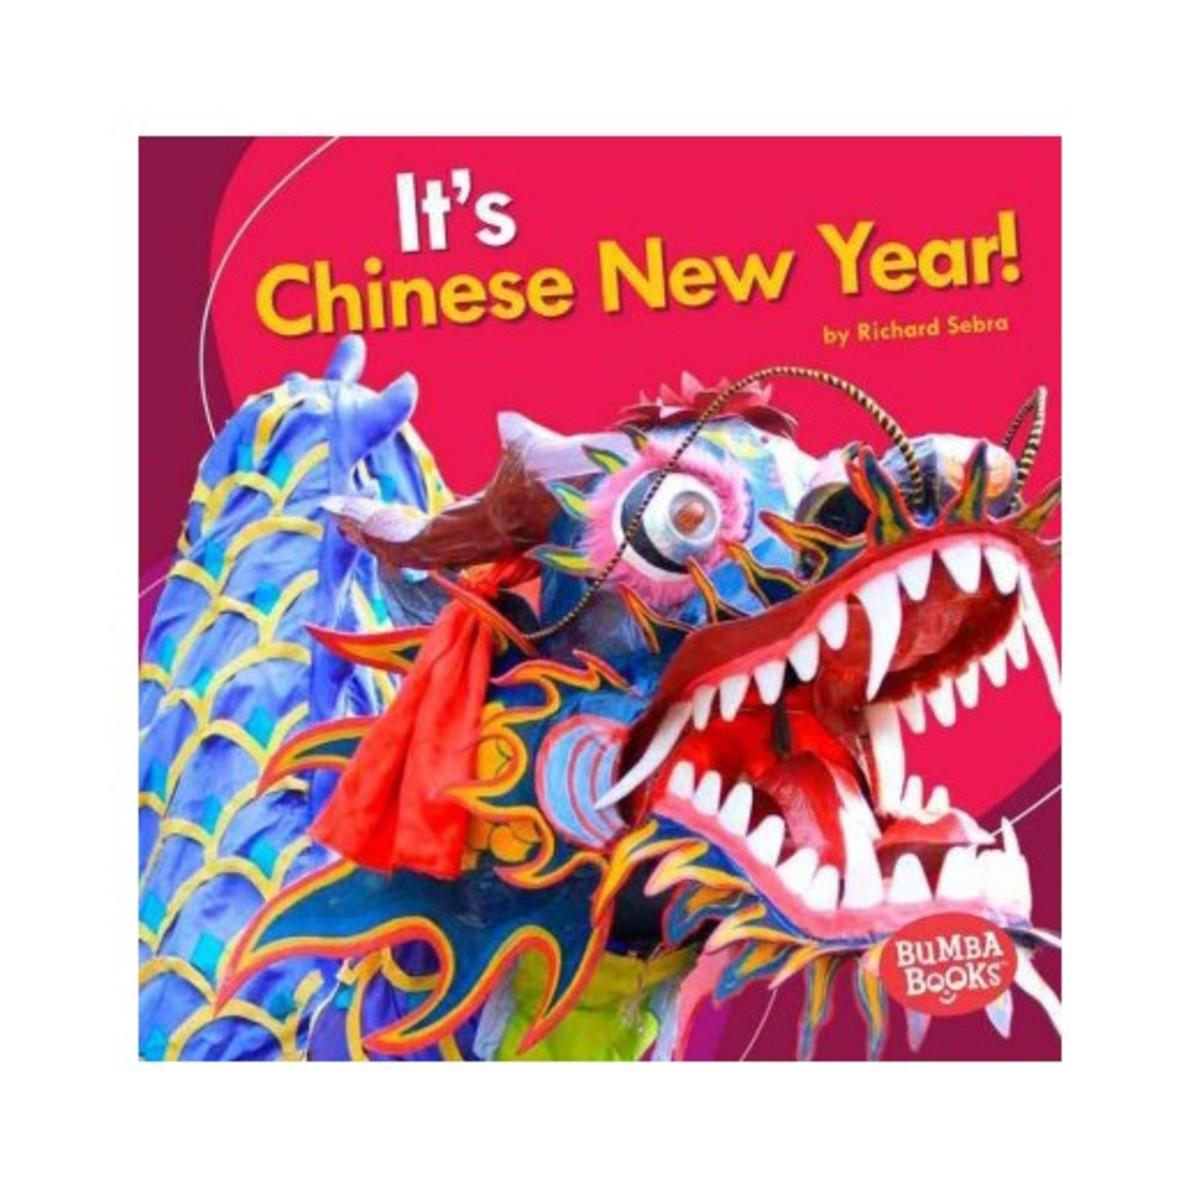 It's Chinese New Year! by Richard Sebra